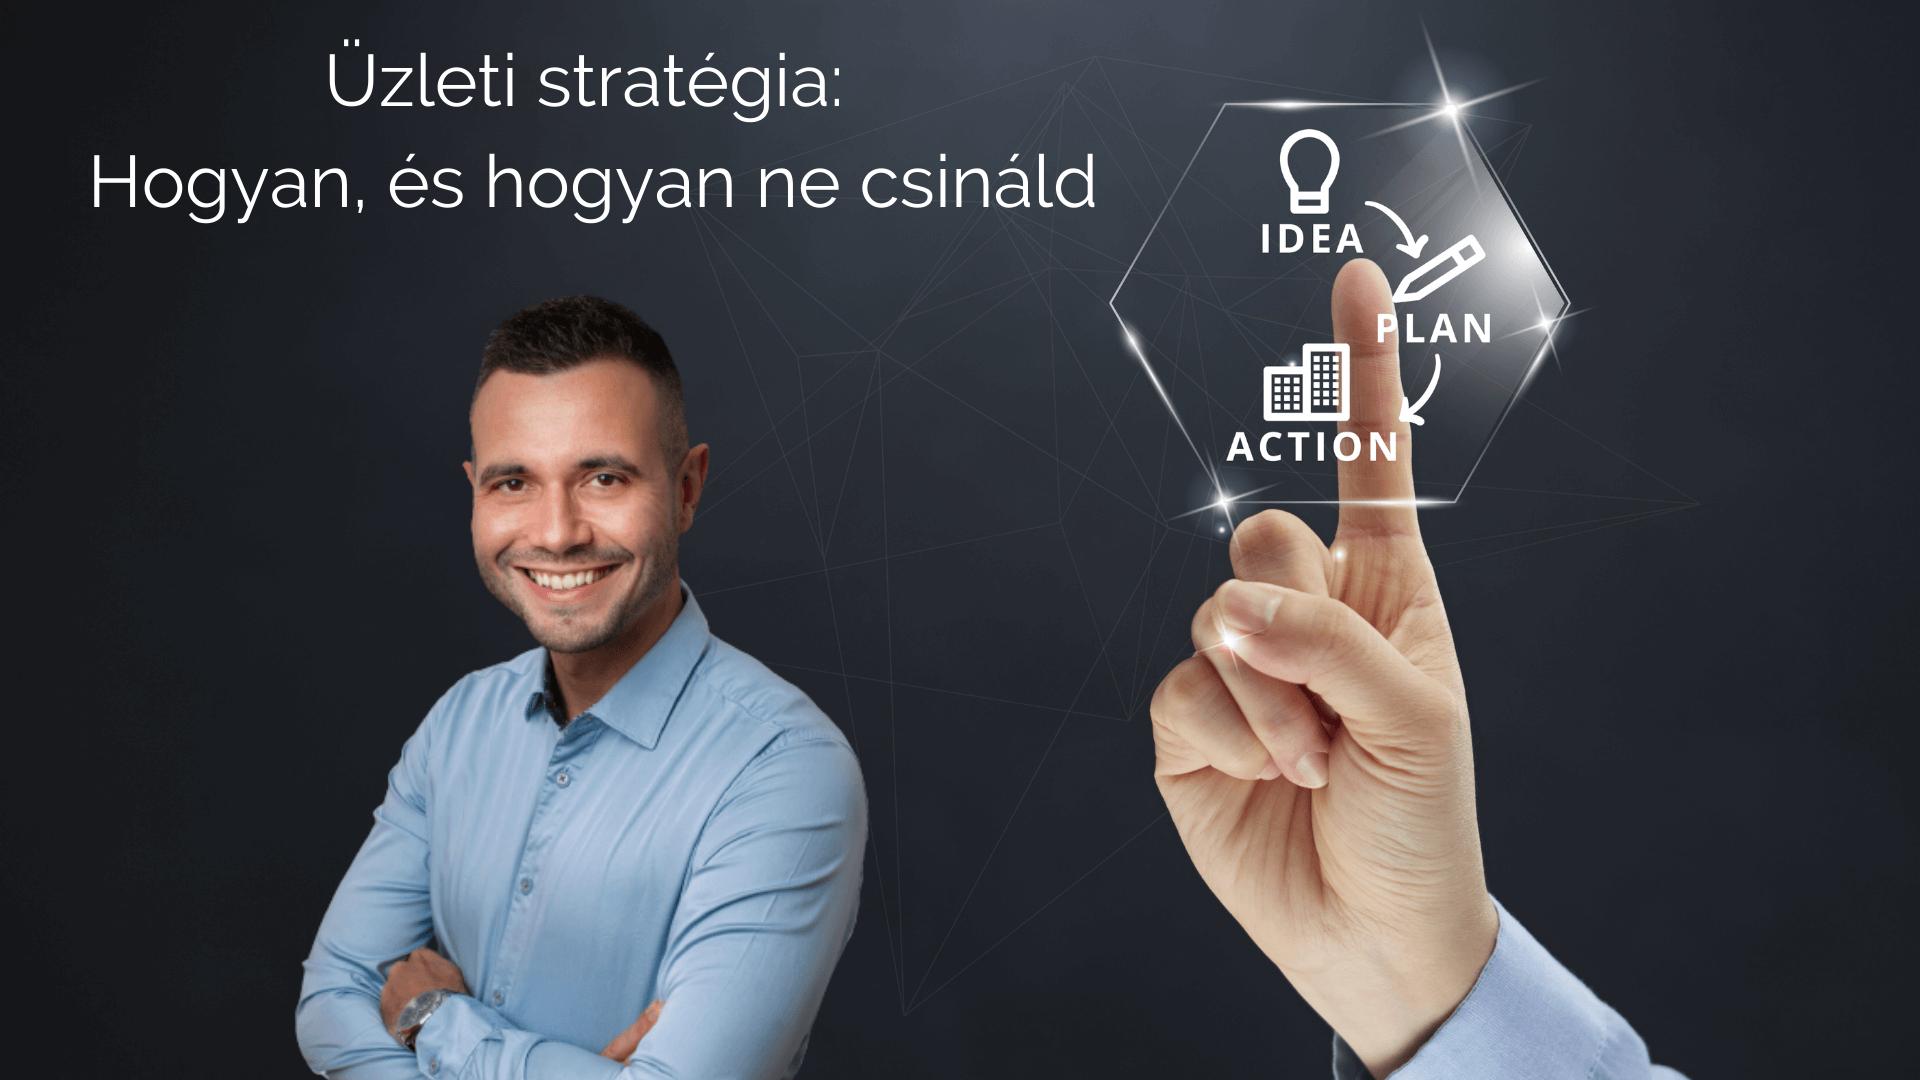 üzleti stratégia